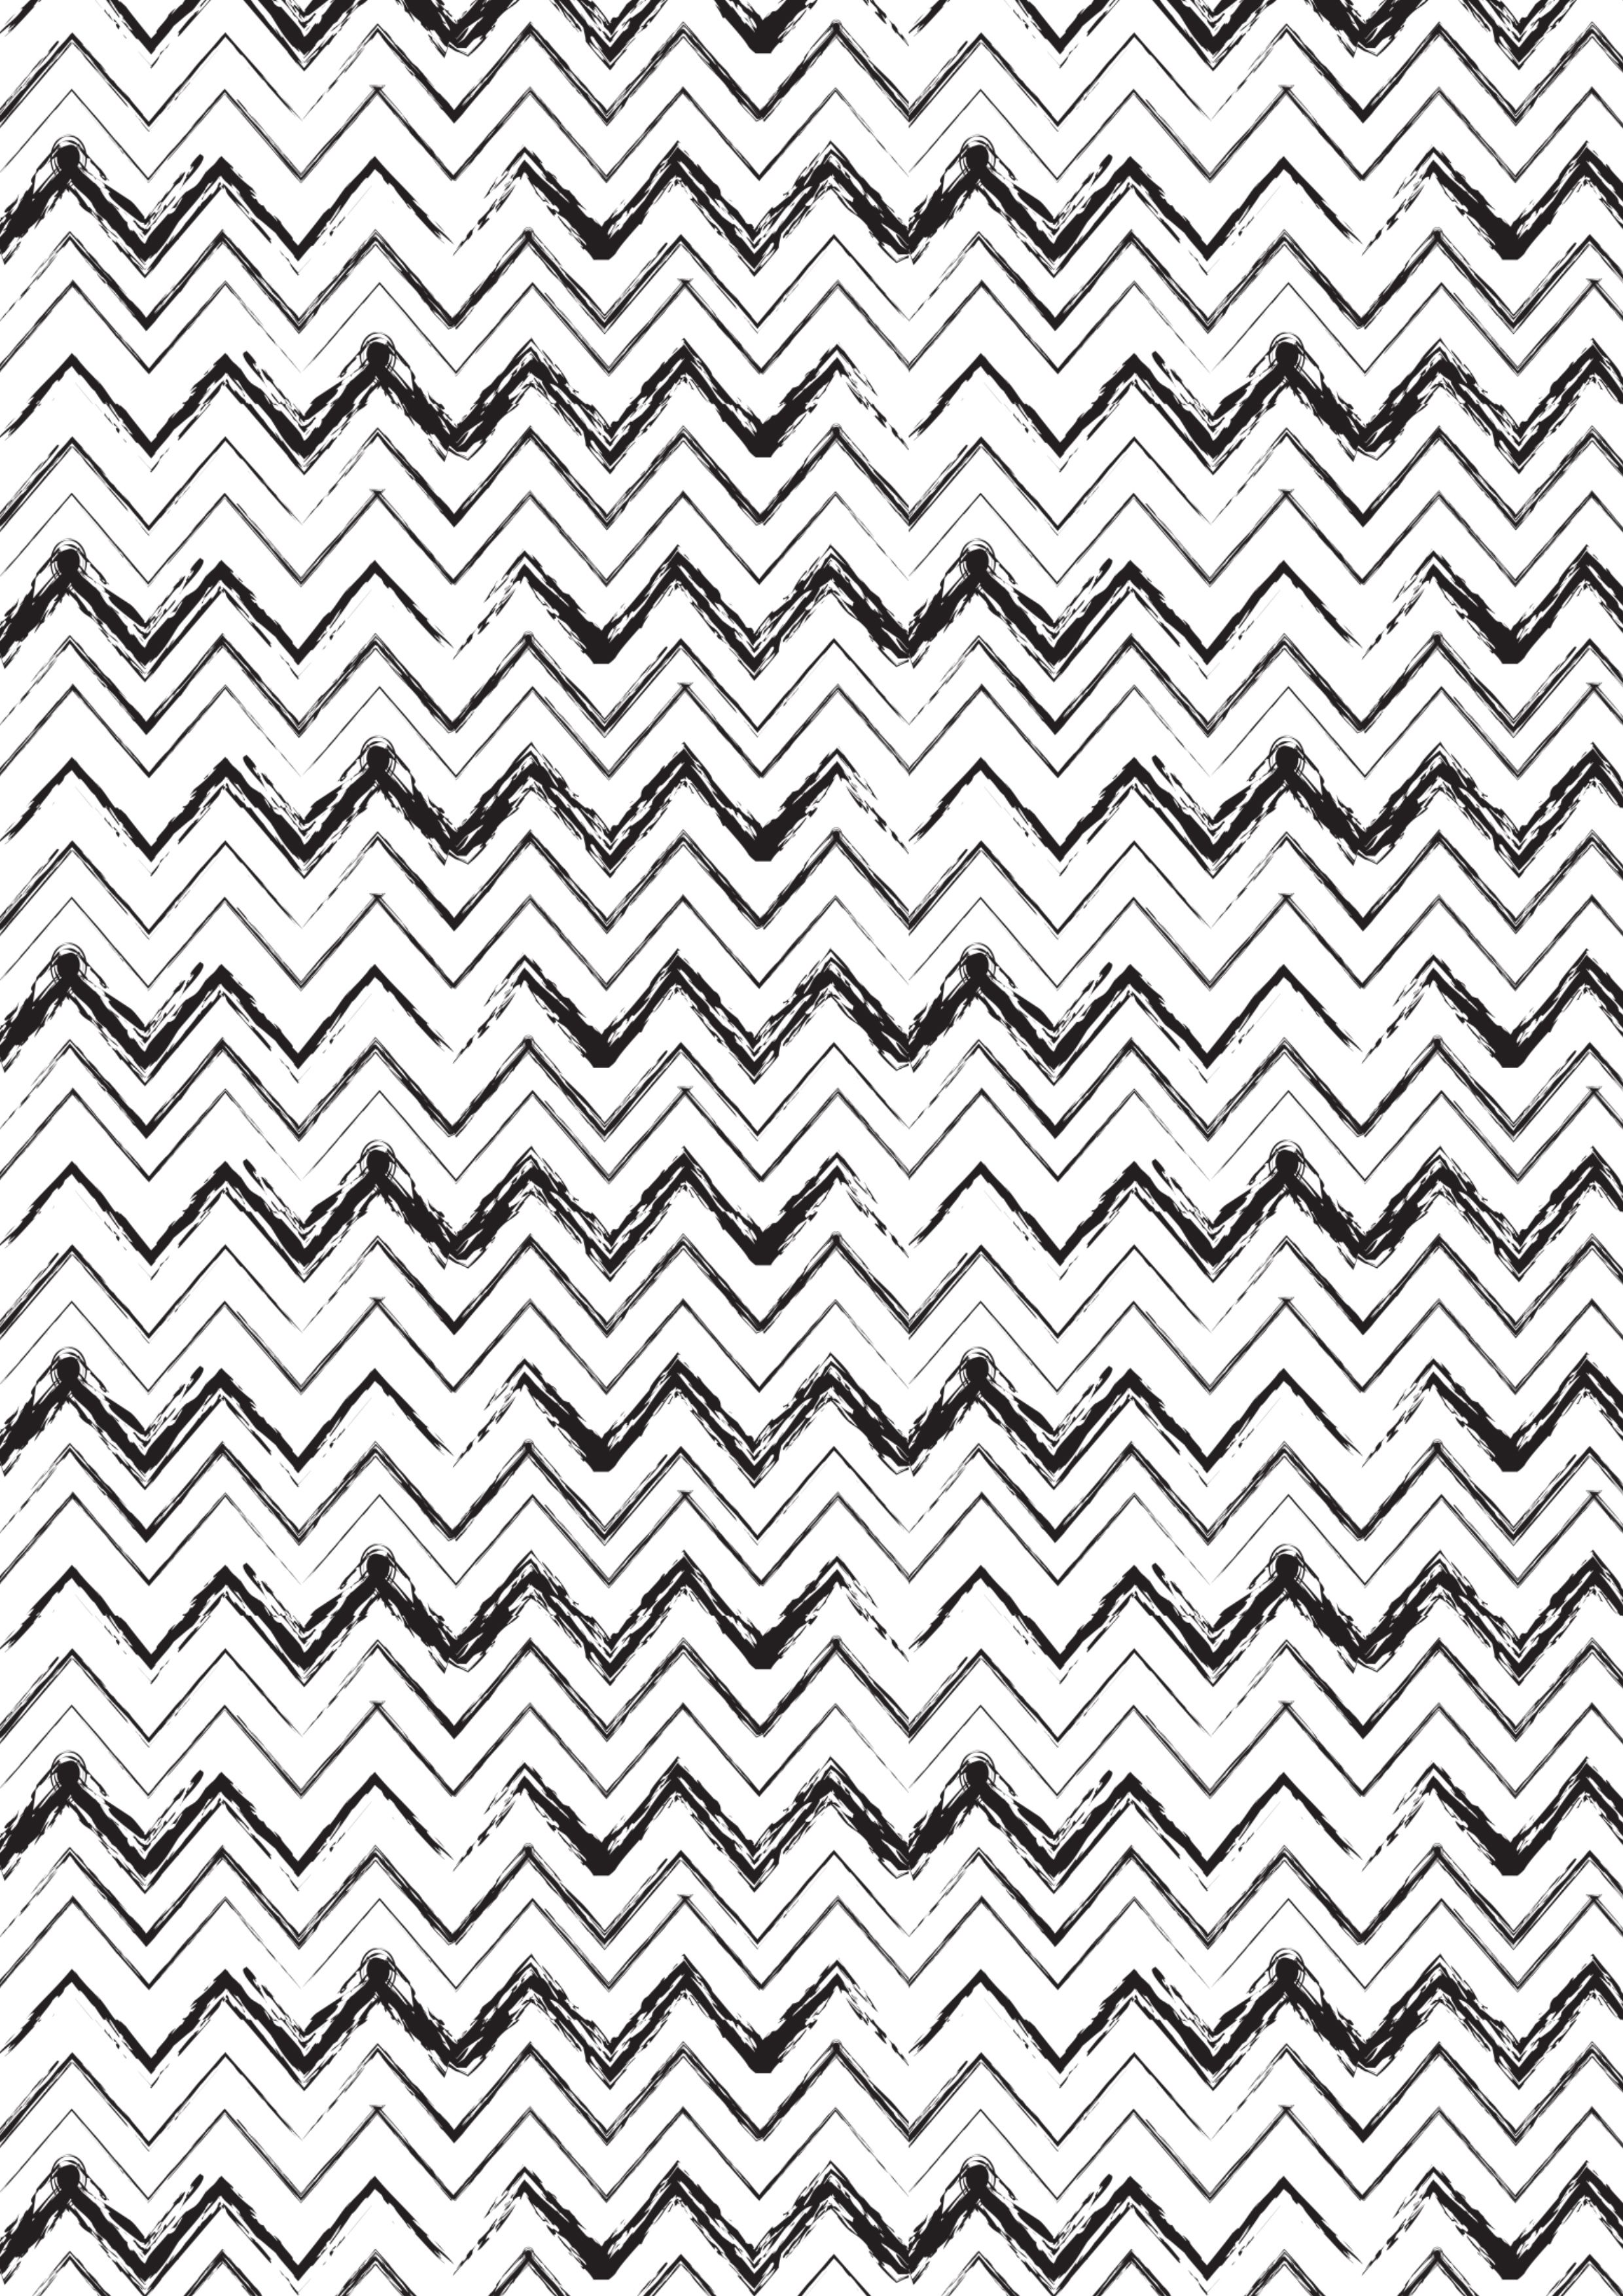 Monochrome Black And White Print Pattern Zigzag PatternsTextures PatternsDesign PatternsPrint PatternsFabric